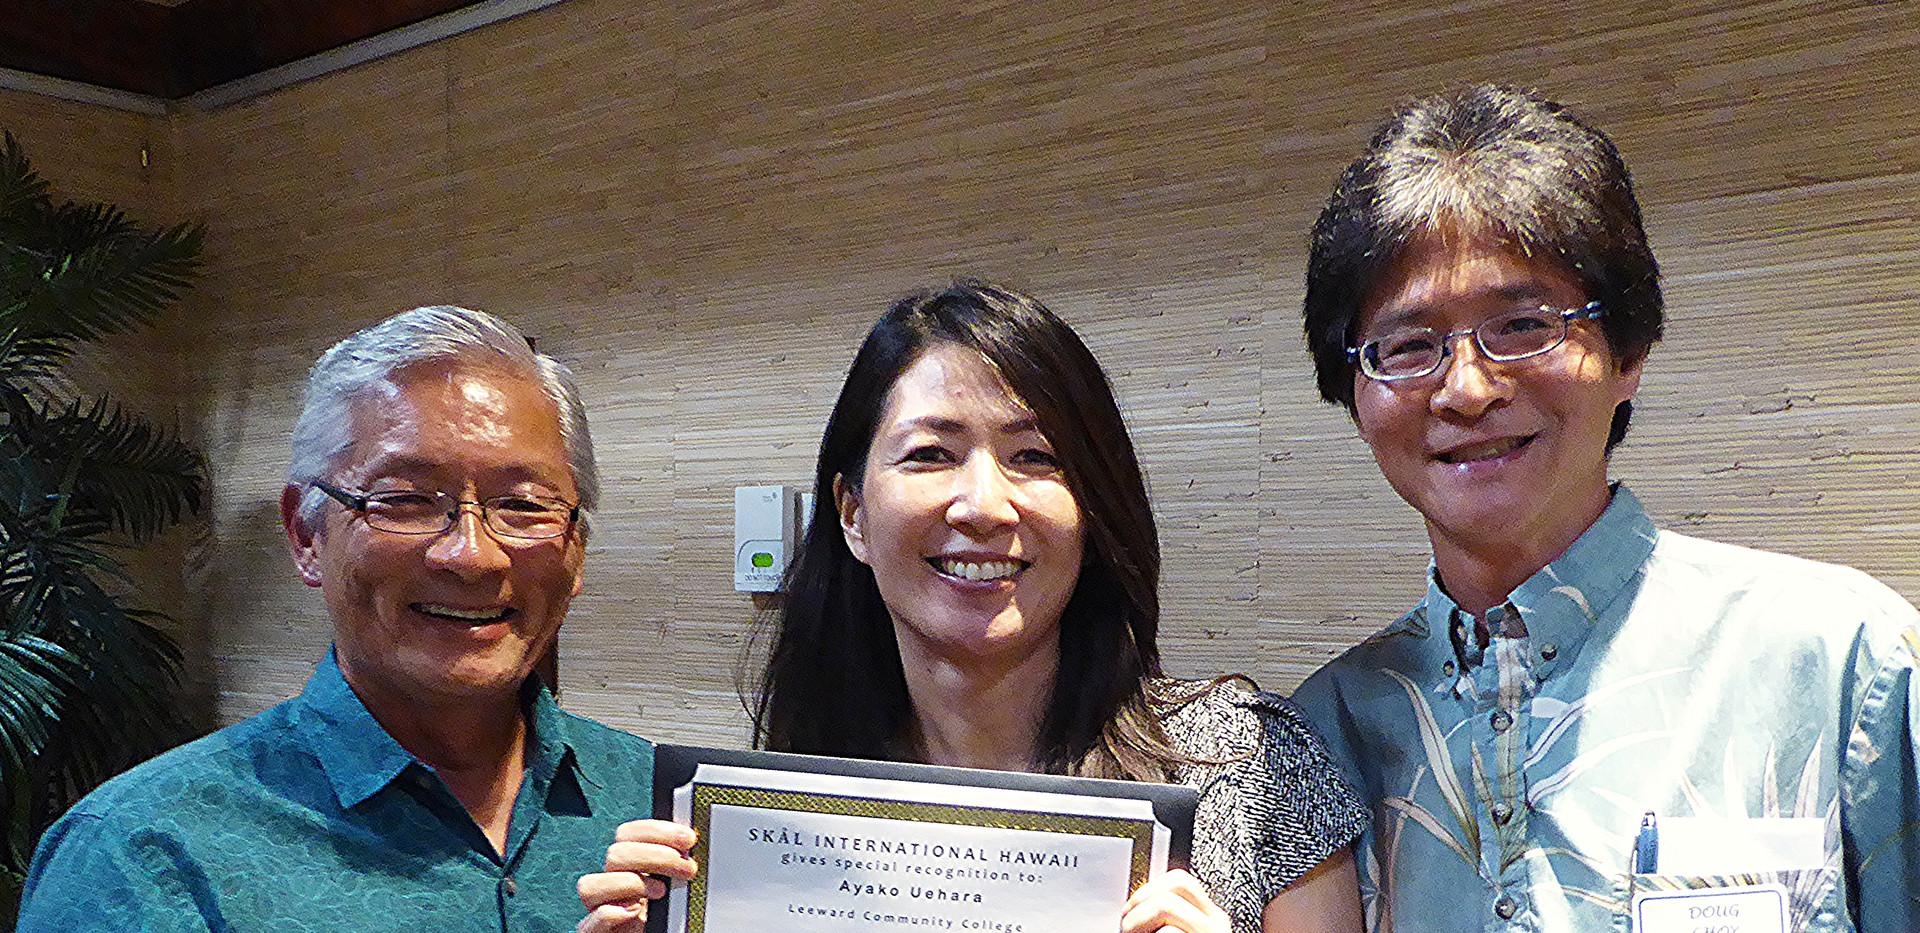 Ted Sakai, Ayako Uihara & Doug Choy / LCC